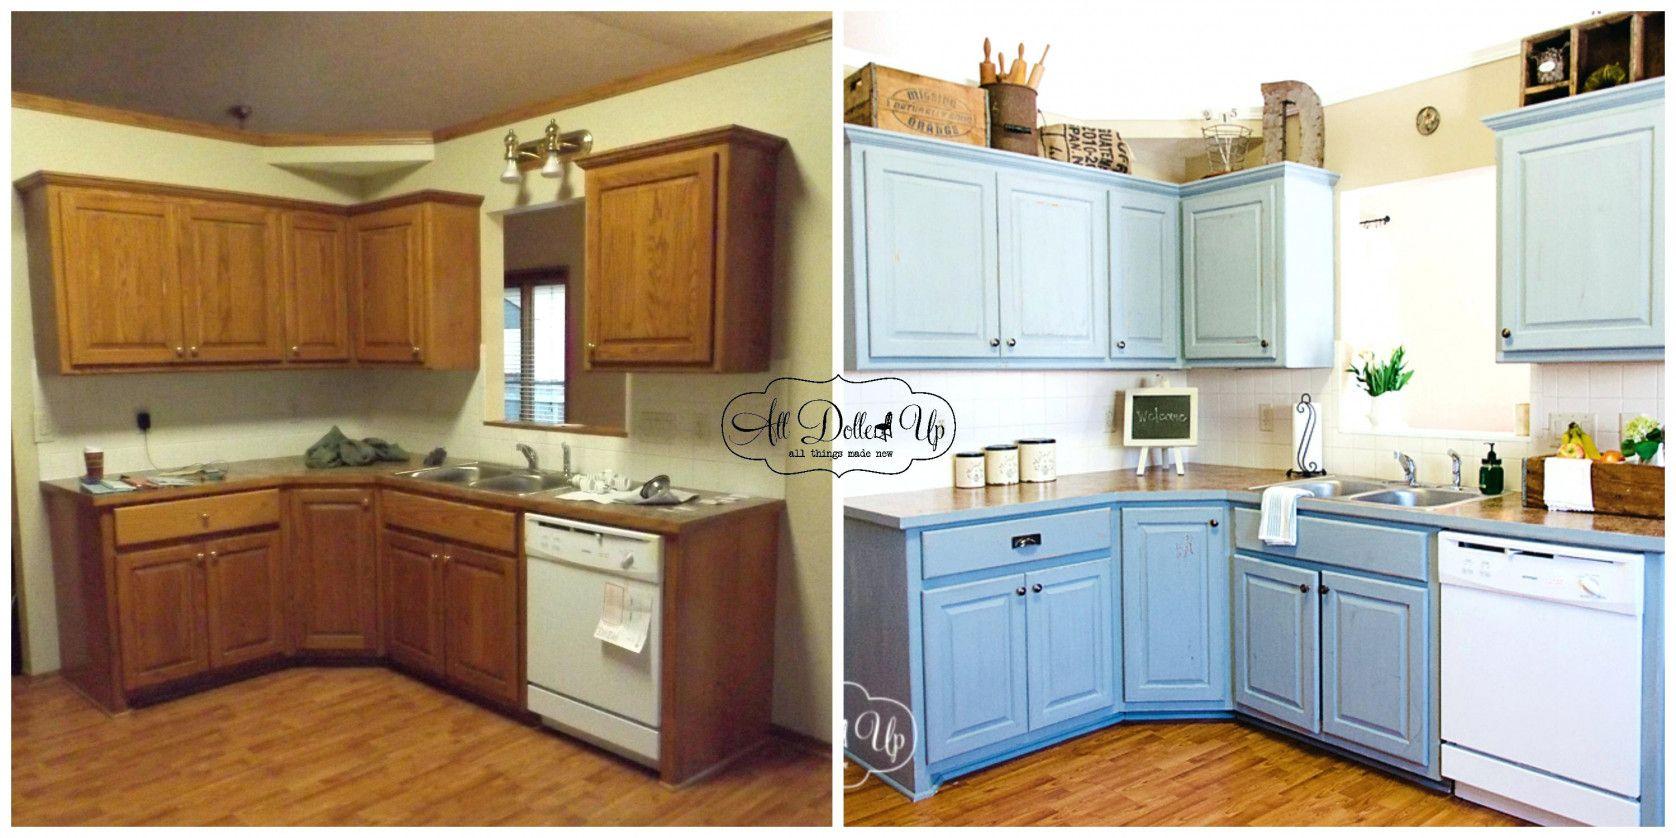 2019 Kitchen Cabinets Price Per Linear Foot Unique Kitchen